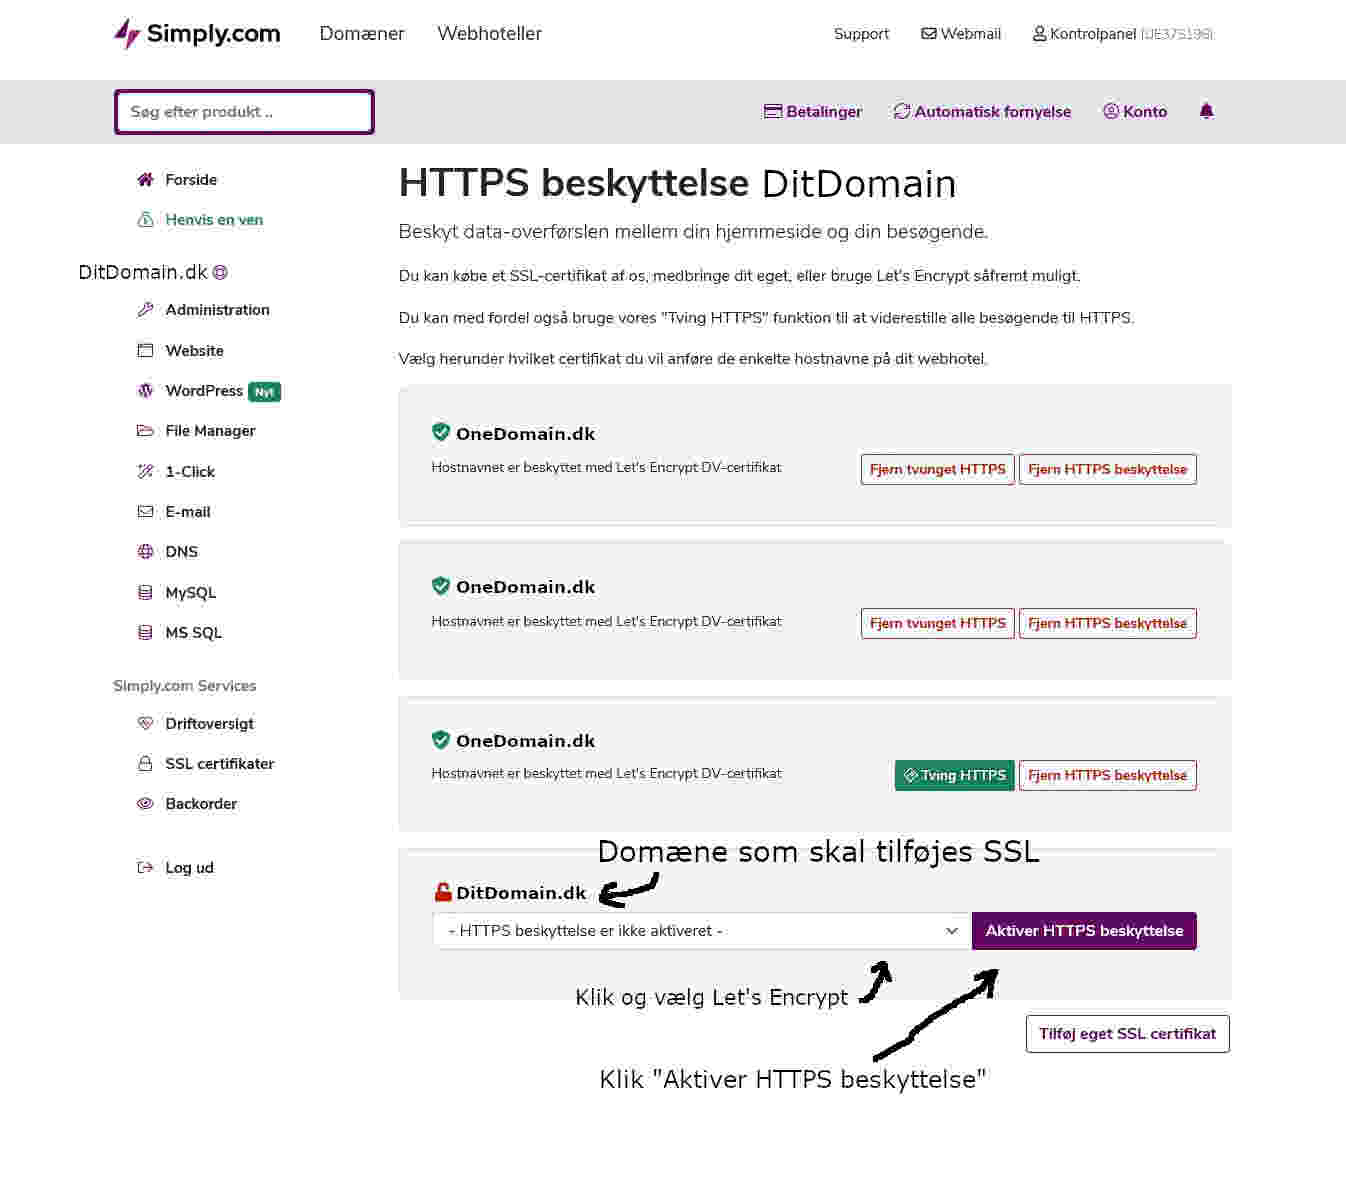 Aktiver HTTPS beskyttelse med SSL Certifikat fra Let's Encrypt